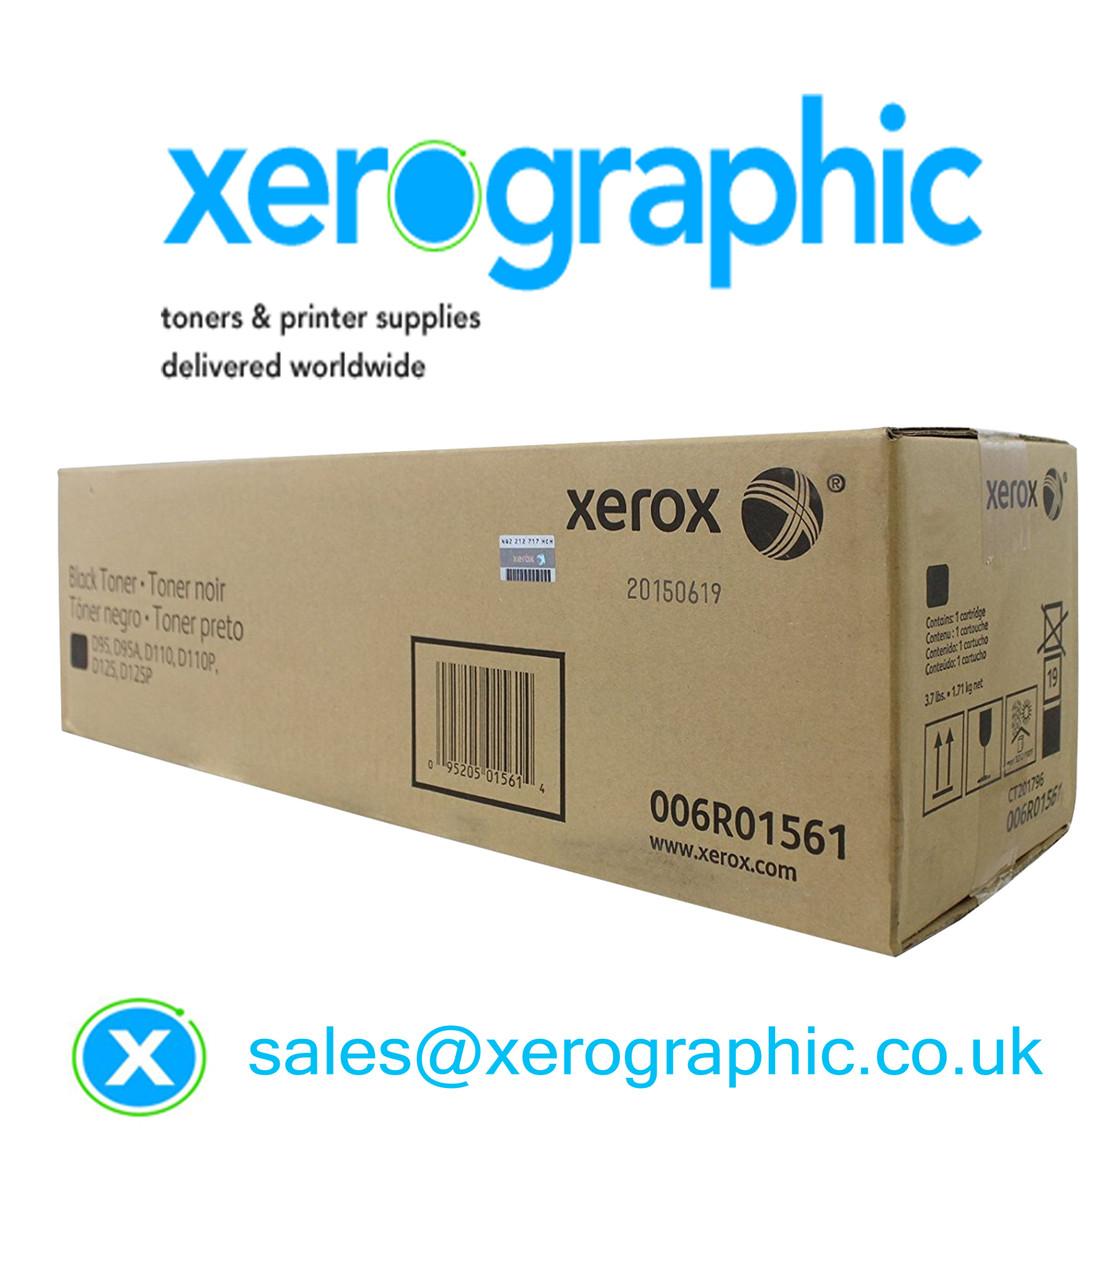 Xerox D95, D110, D125P, Printer Genuine Black Toner Cartridge 006R01561,  6R01561, (£149 00)